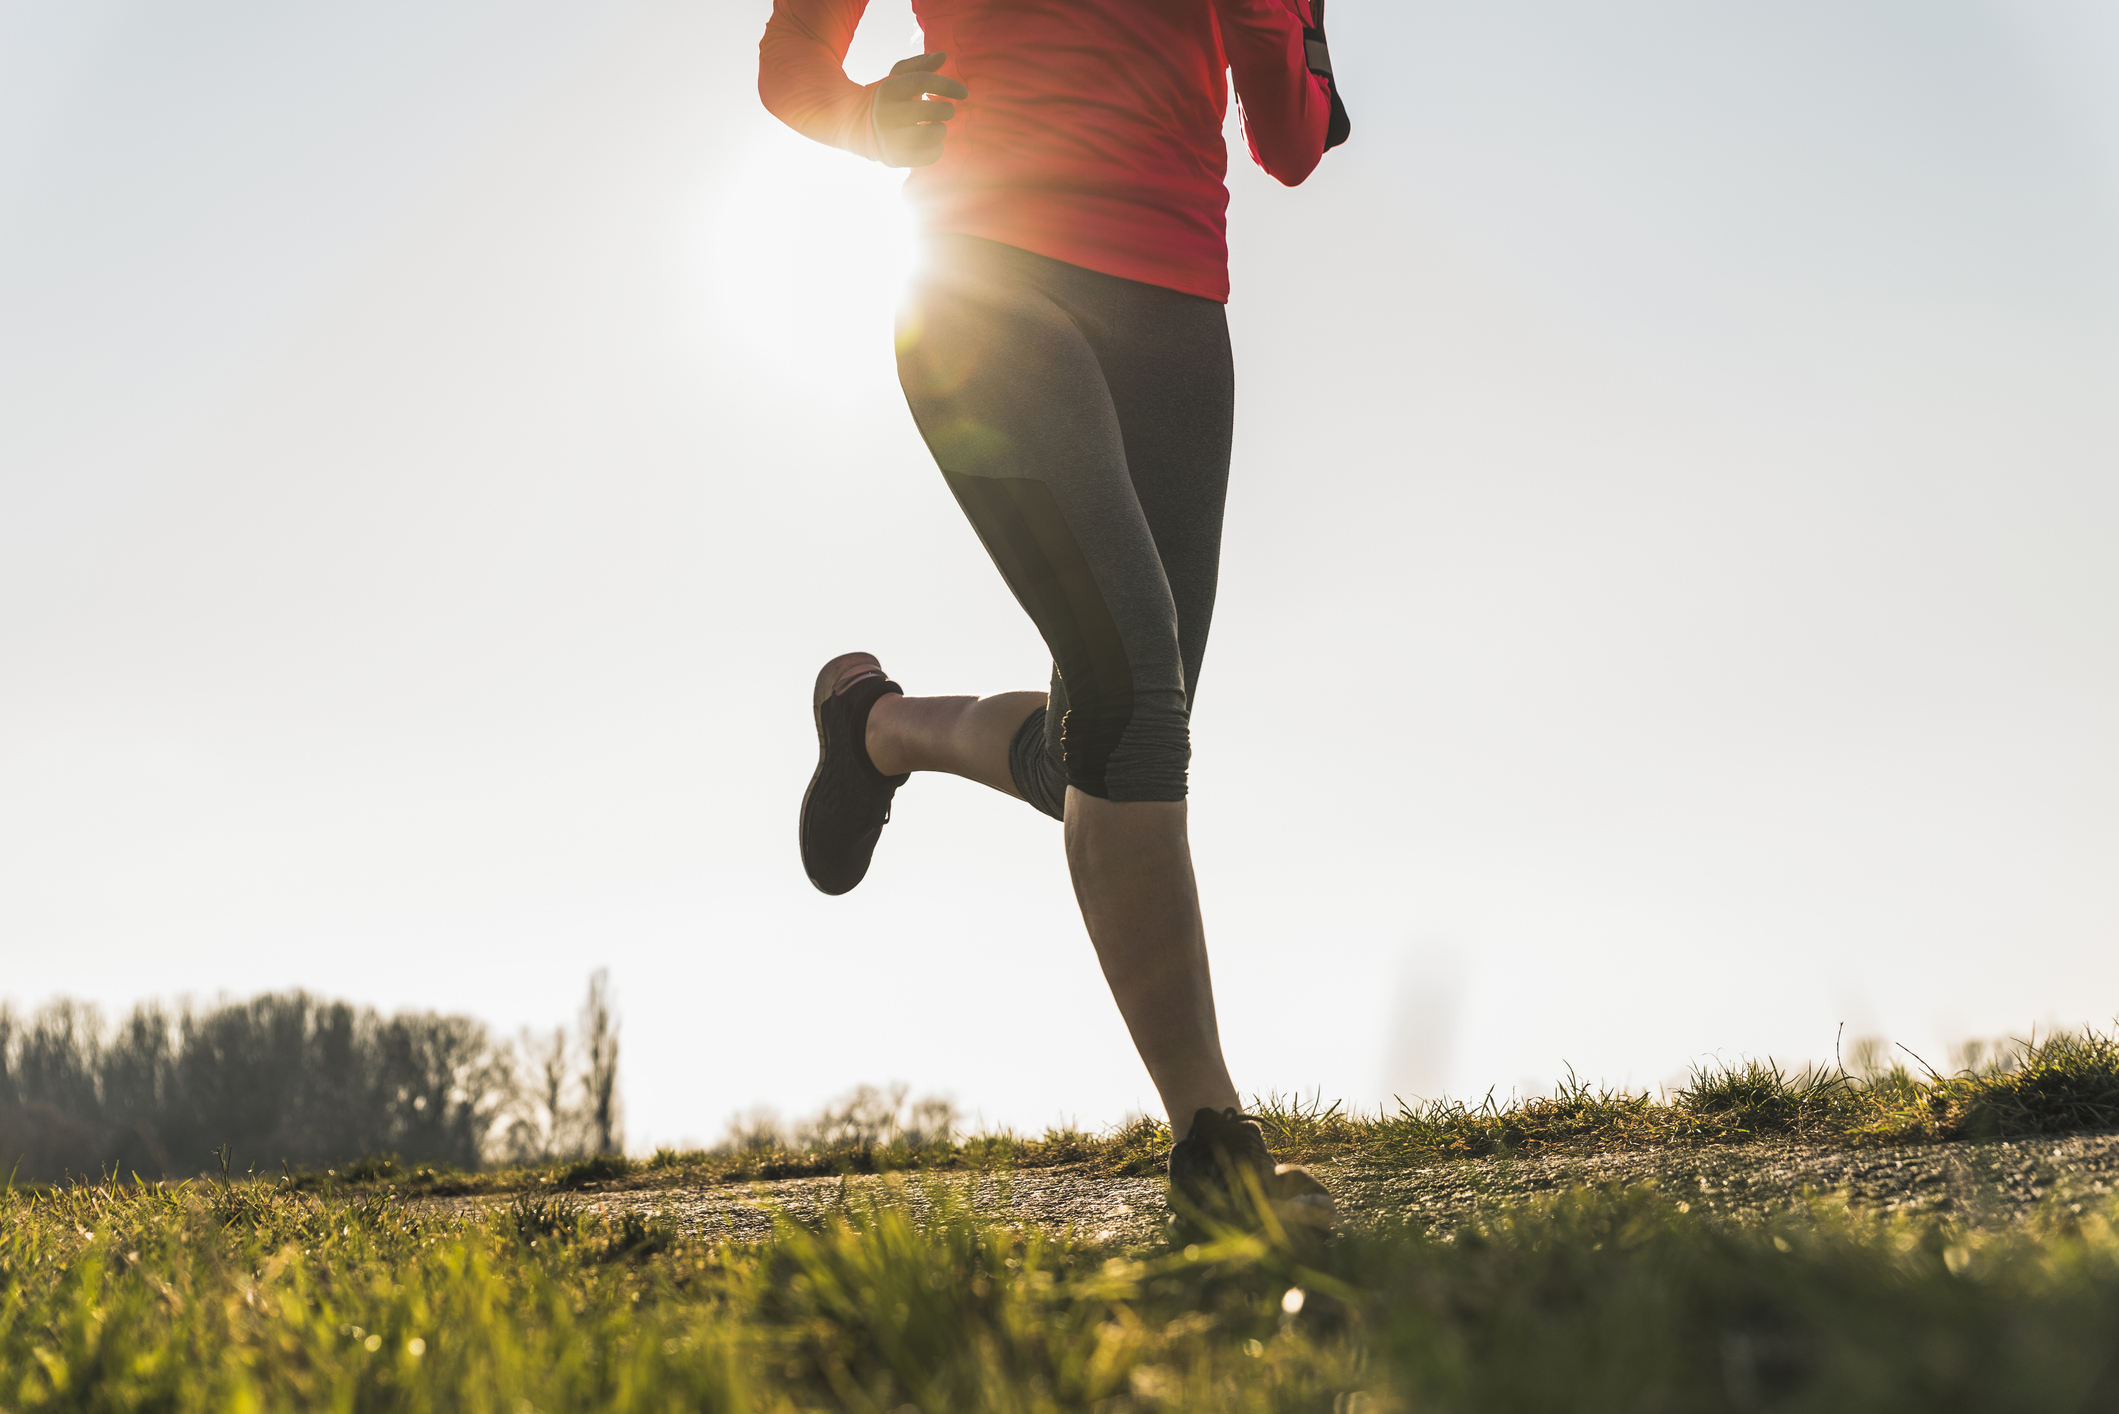 Female runner assaulted in Surrey